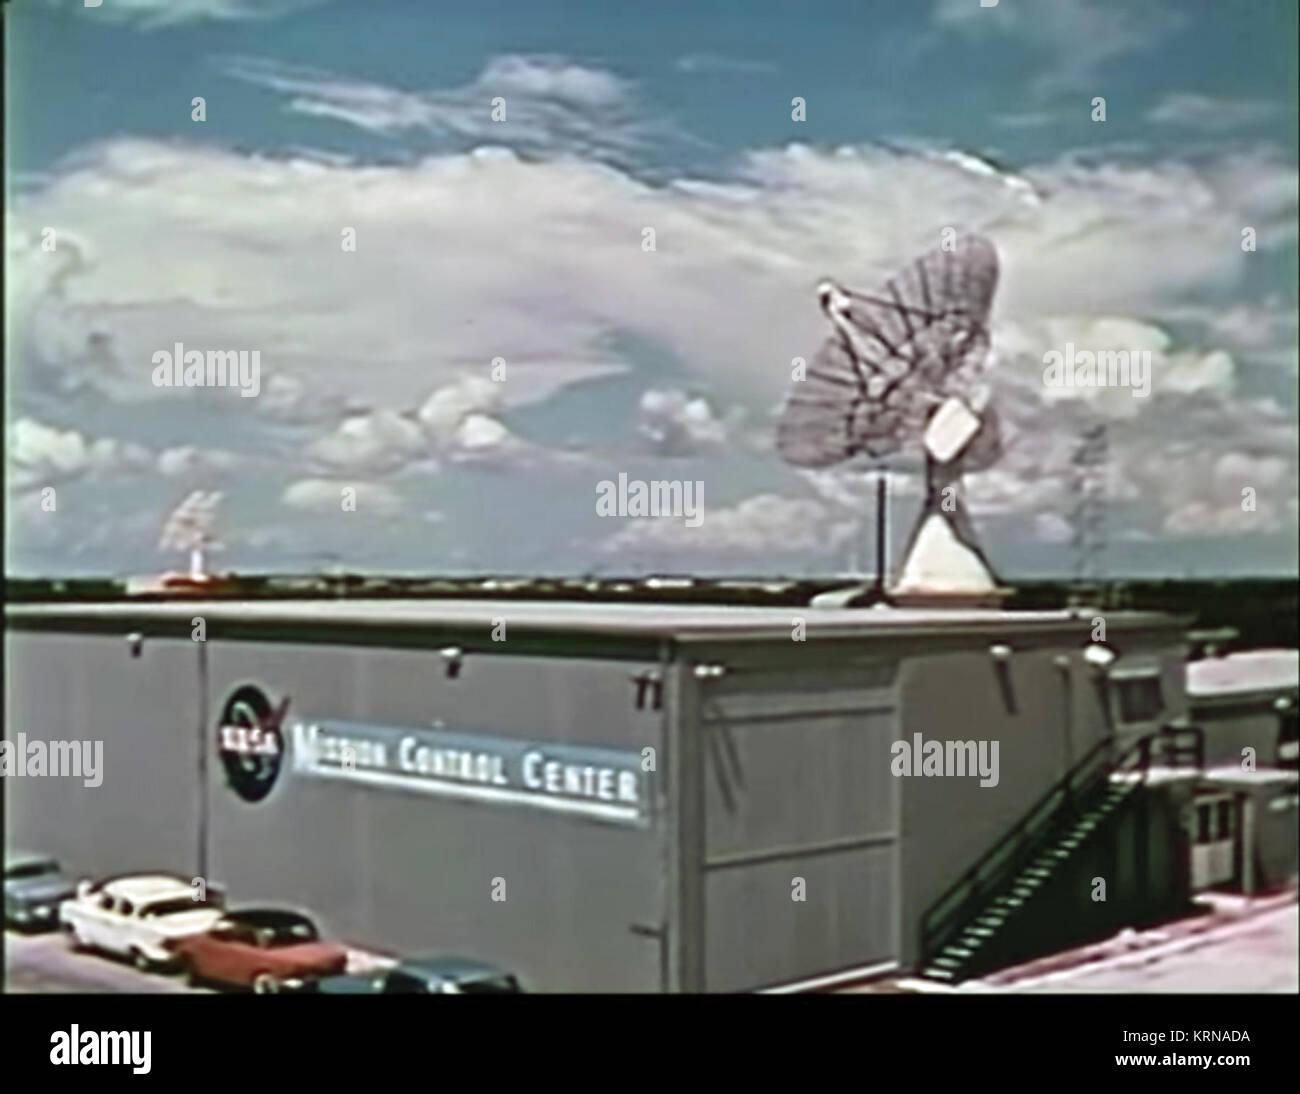 NASA Mission Control Center, Cape Canaveral 1965 - Stock Image